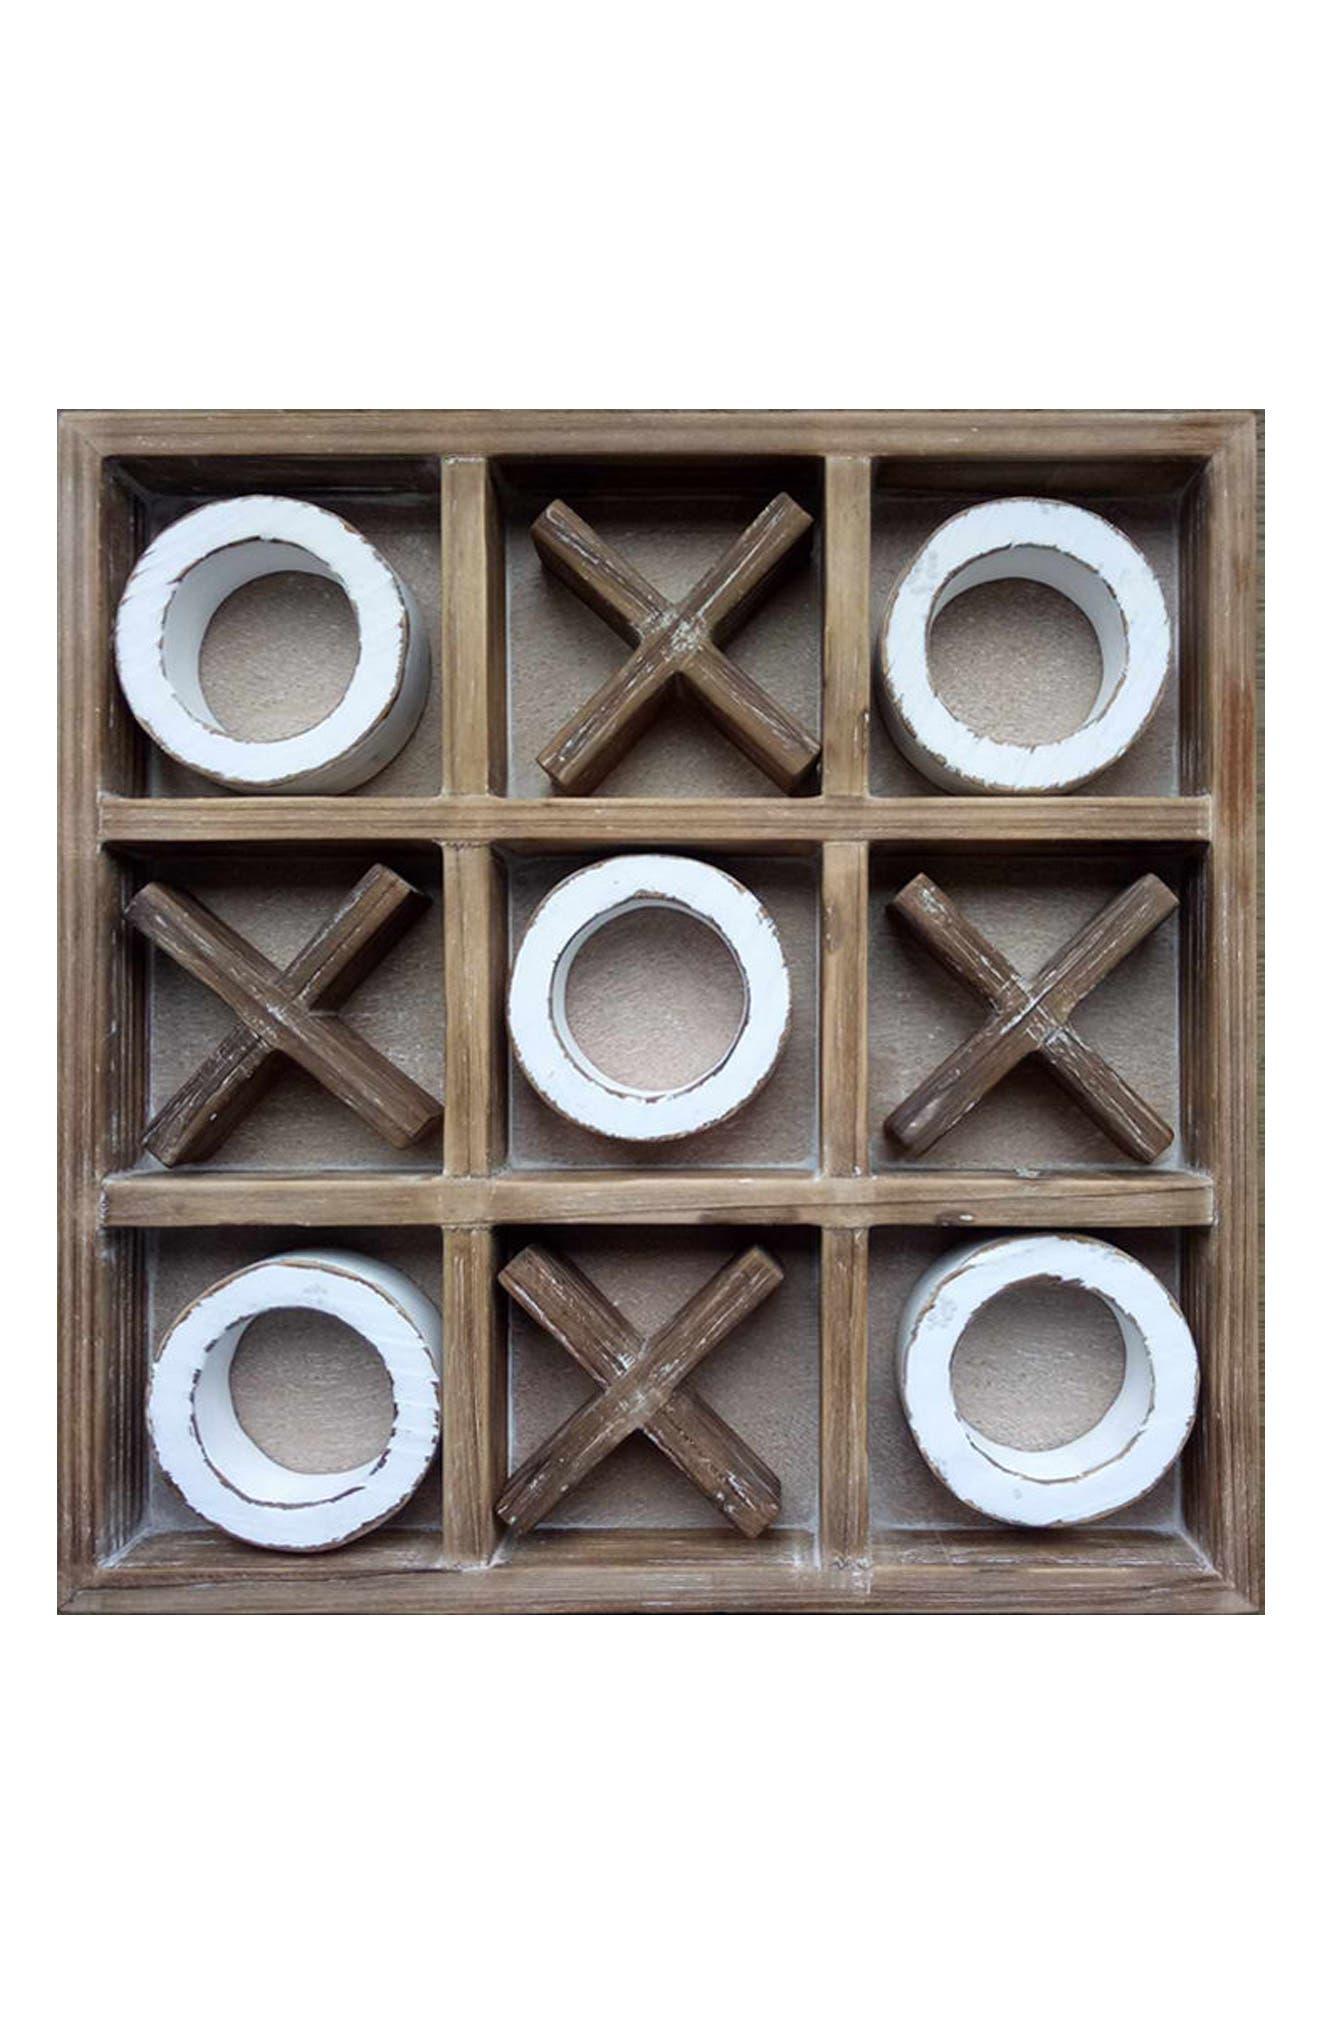 Alternate Image 1 Selected - Crystal Art Gallery Tic Tac Toe Wooden Wall Art